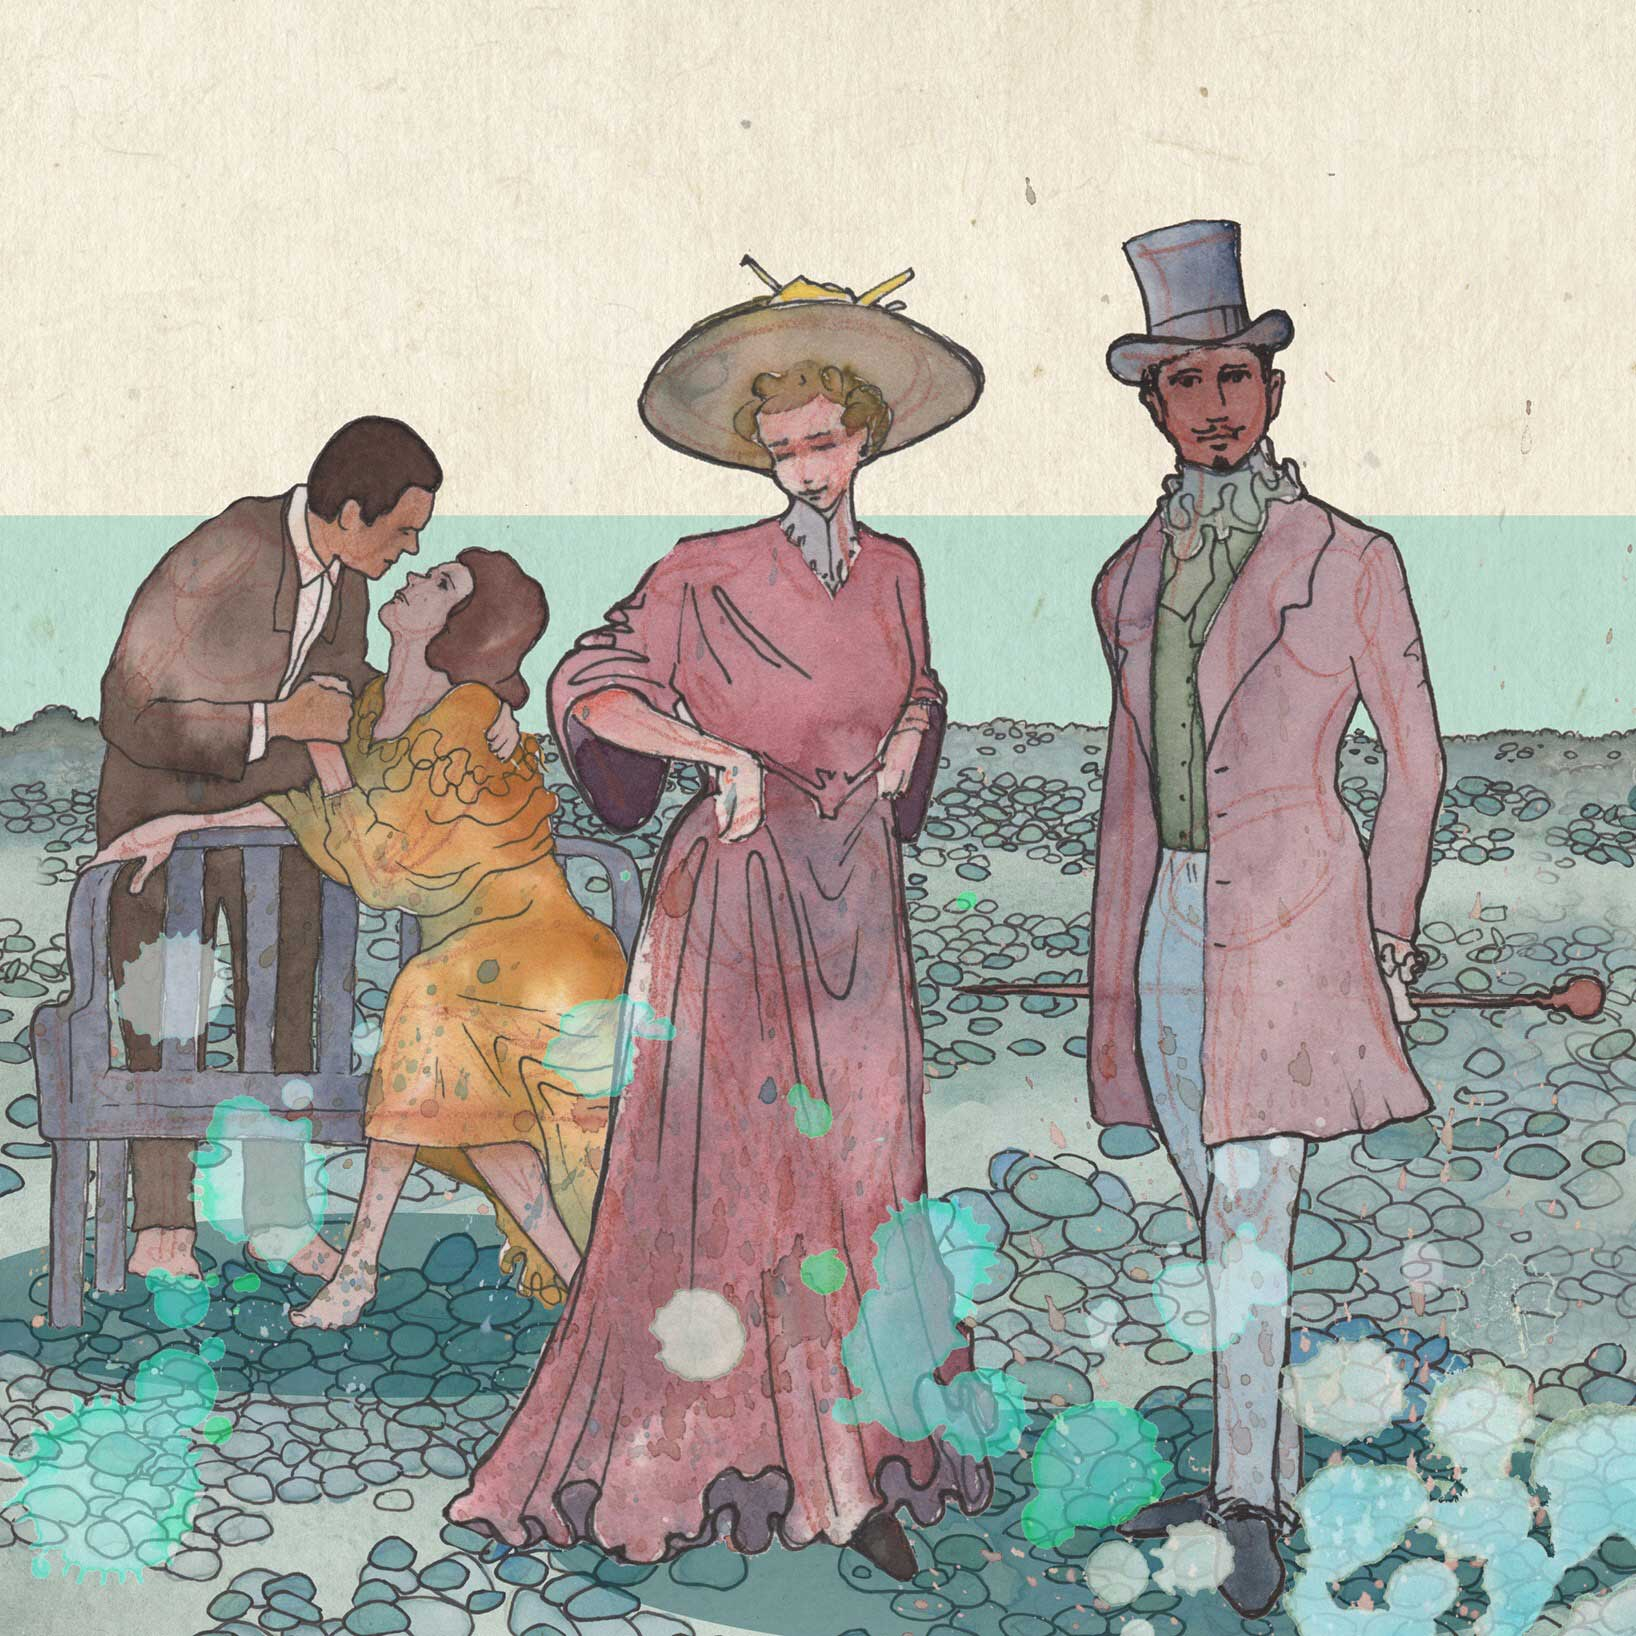 Lido-Plage-Ronny-Bergfeldt-watercolor-illustration-1.jpg